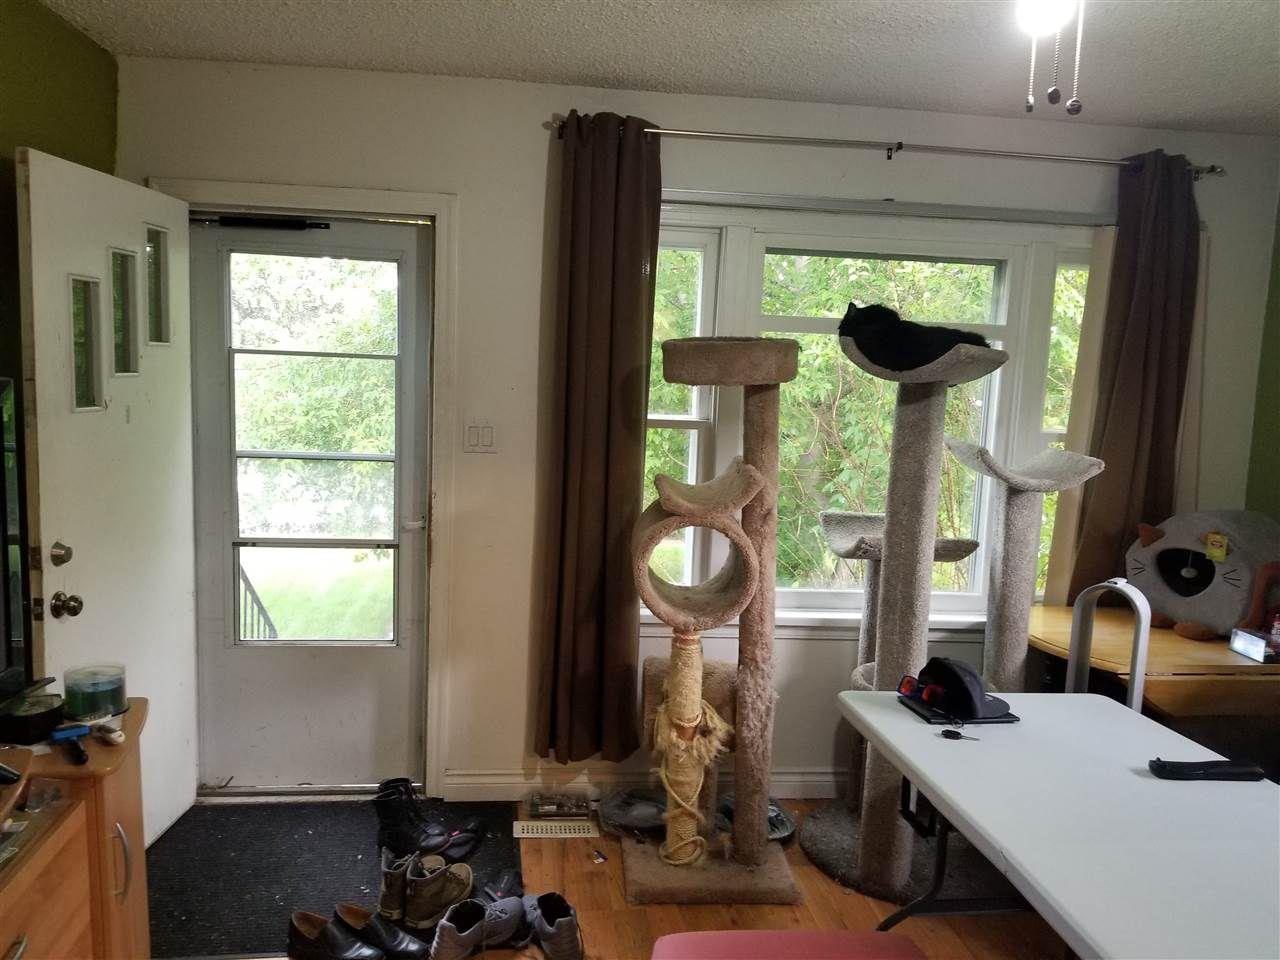 Photo 5: Photos: 9242 152 Street in Edmonton: Zone 22 House for sale : MLS®# E4158939